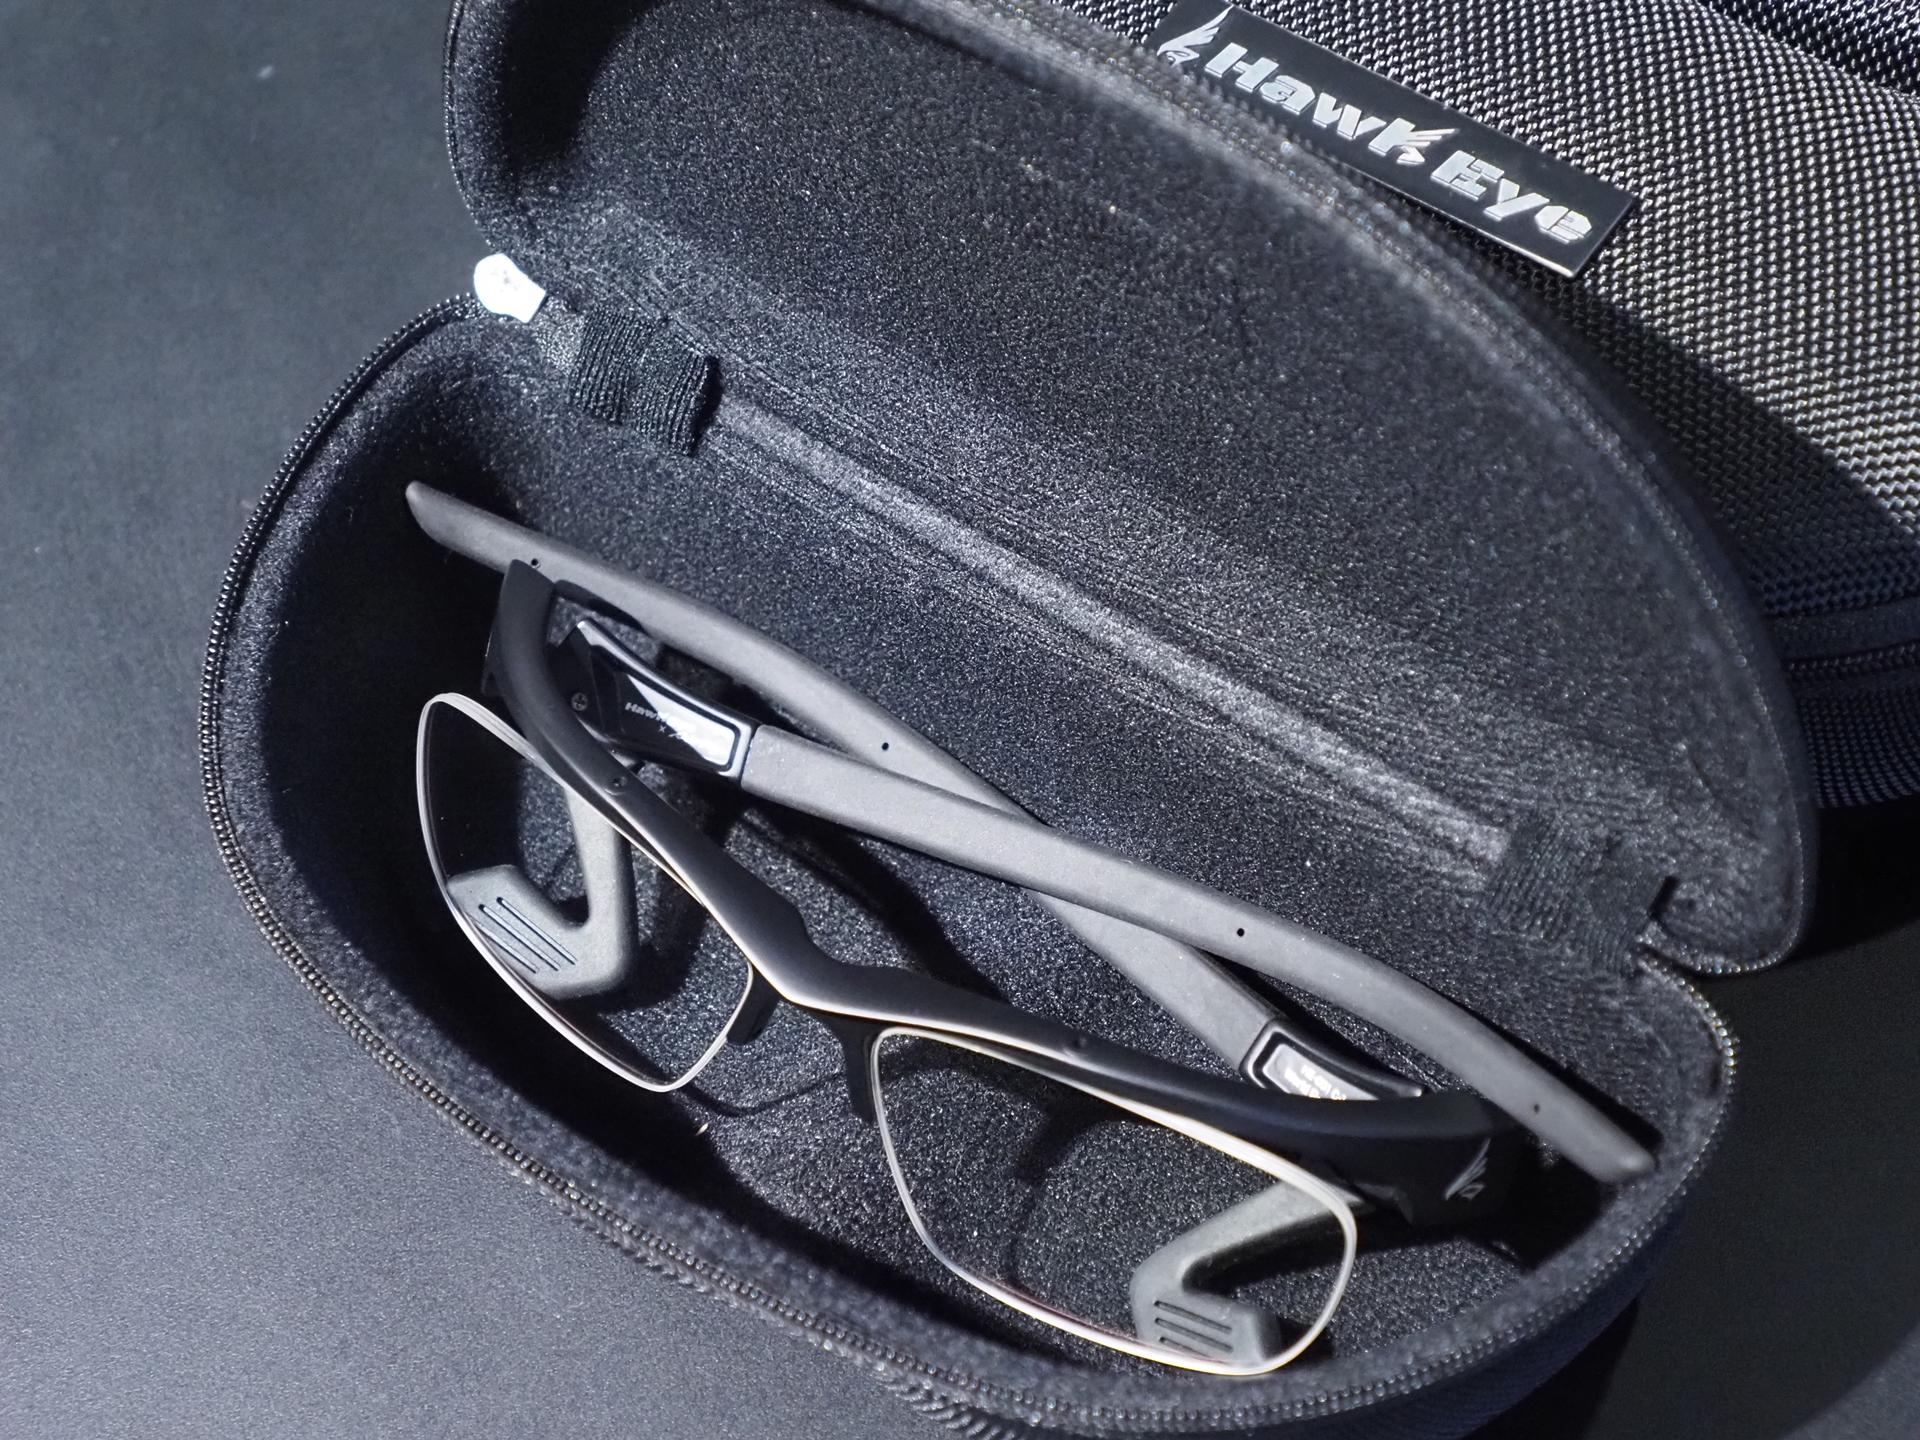 「HawkEye」には本体のほか、この専用セミハードケース、さらにレンズの汚れを落とし、曇り止め効果を付加するレンズクロスが付属する